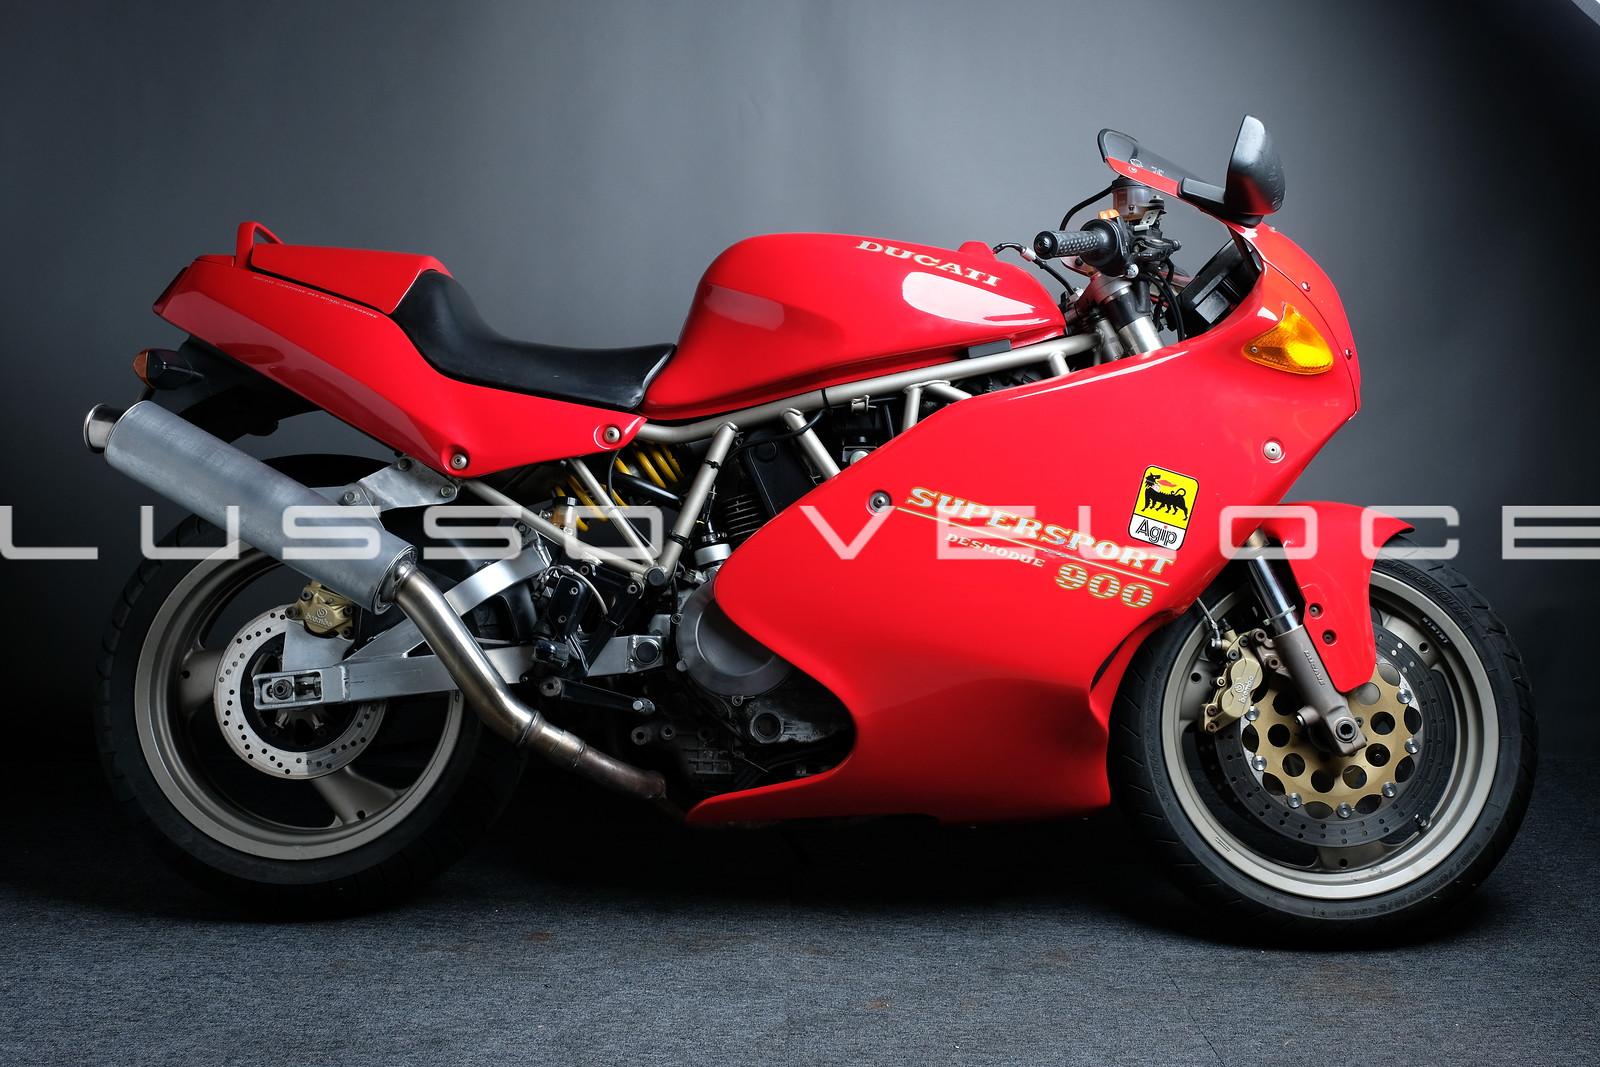 Ducati 900 SS Carb